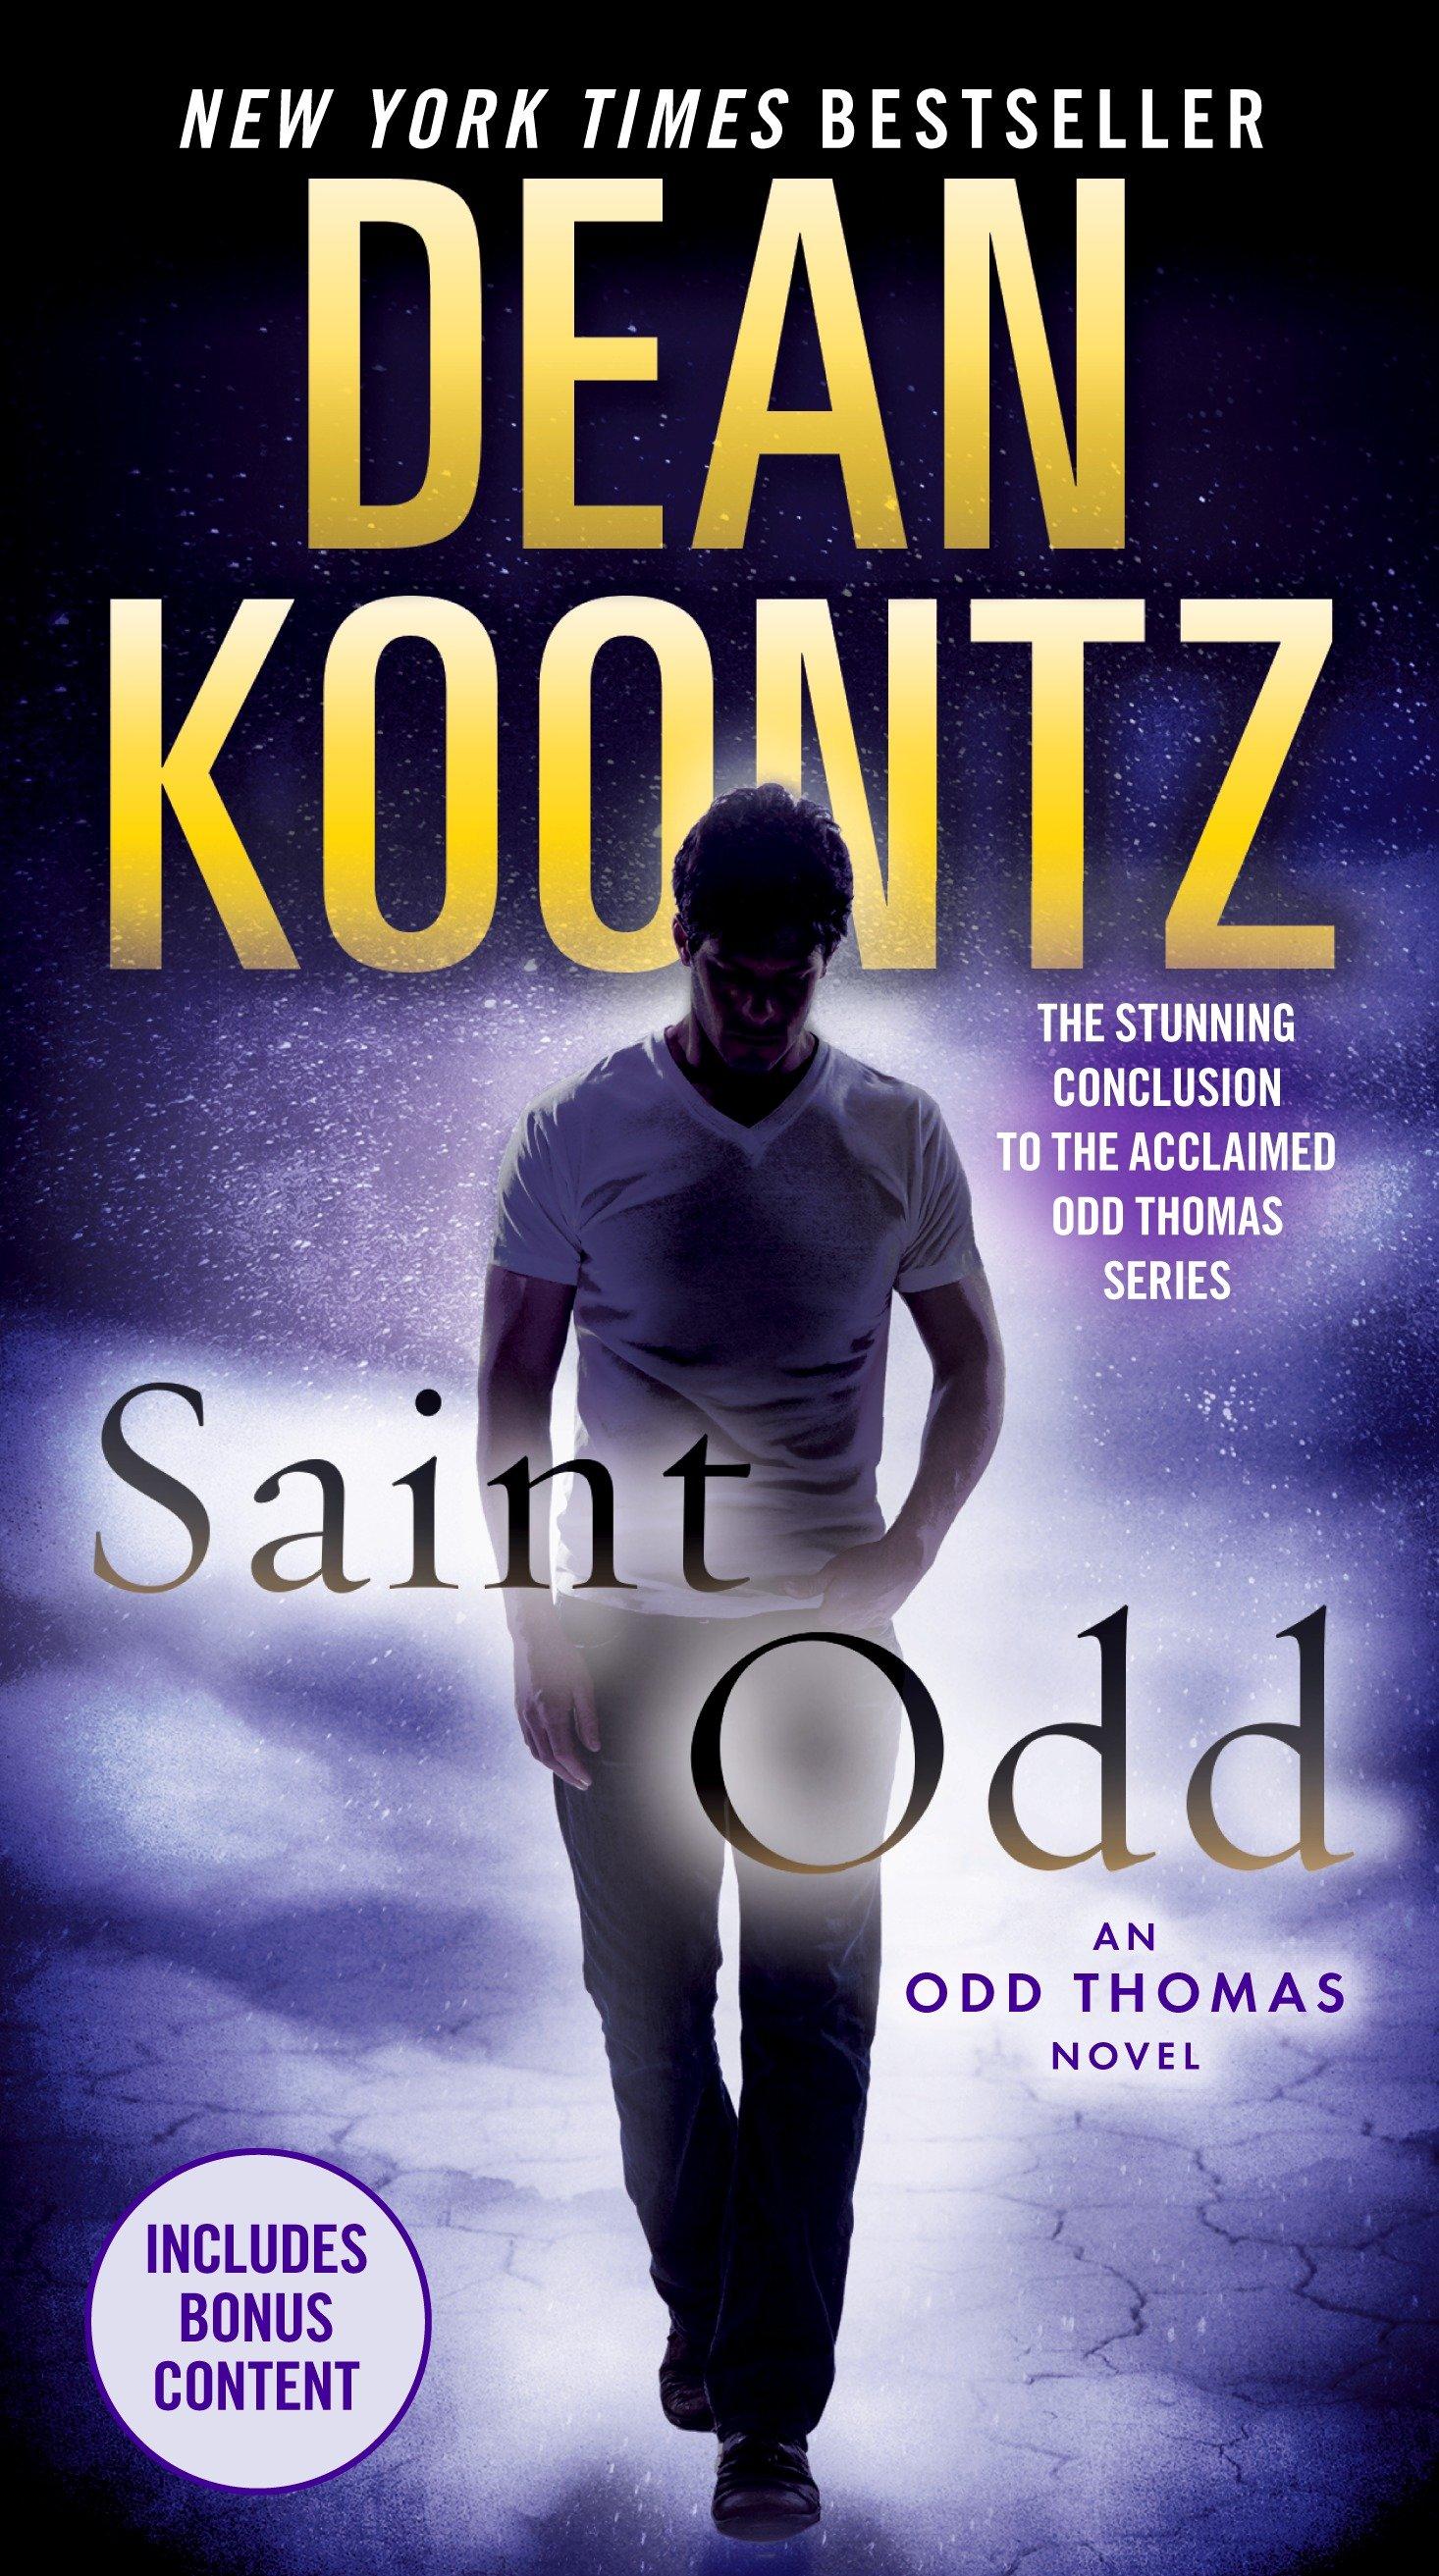 Saint Odd an Odd Thomas novel cover image